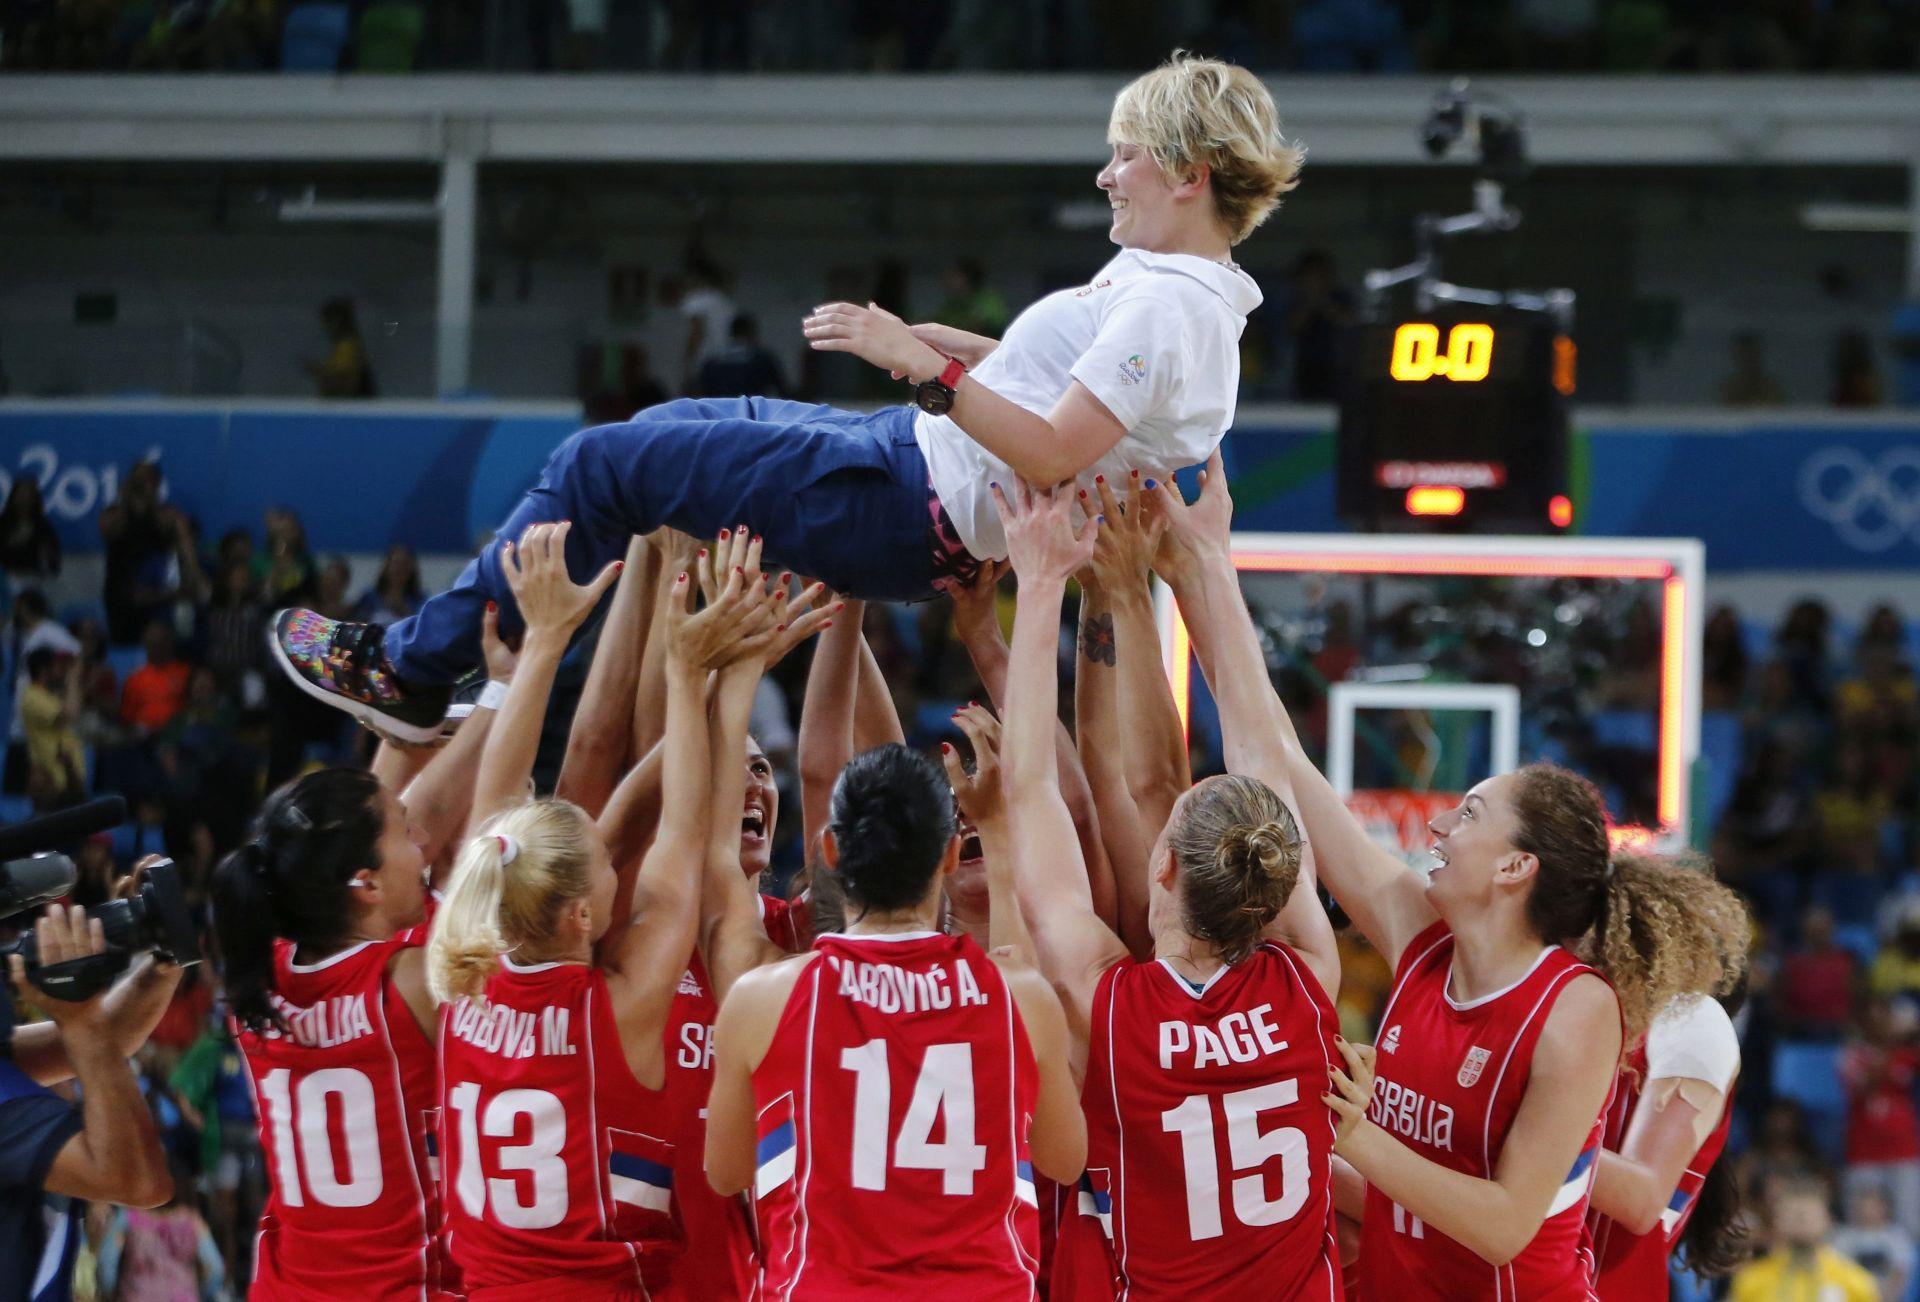 OI RIO Srpske košarkašice osvojile broncu